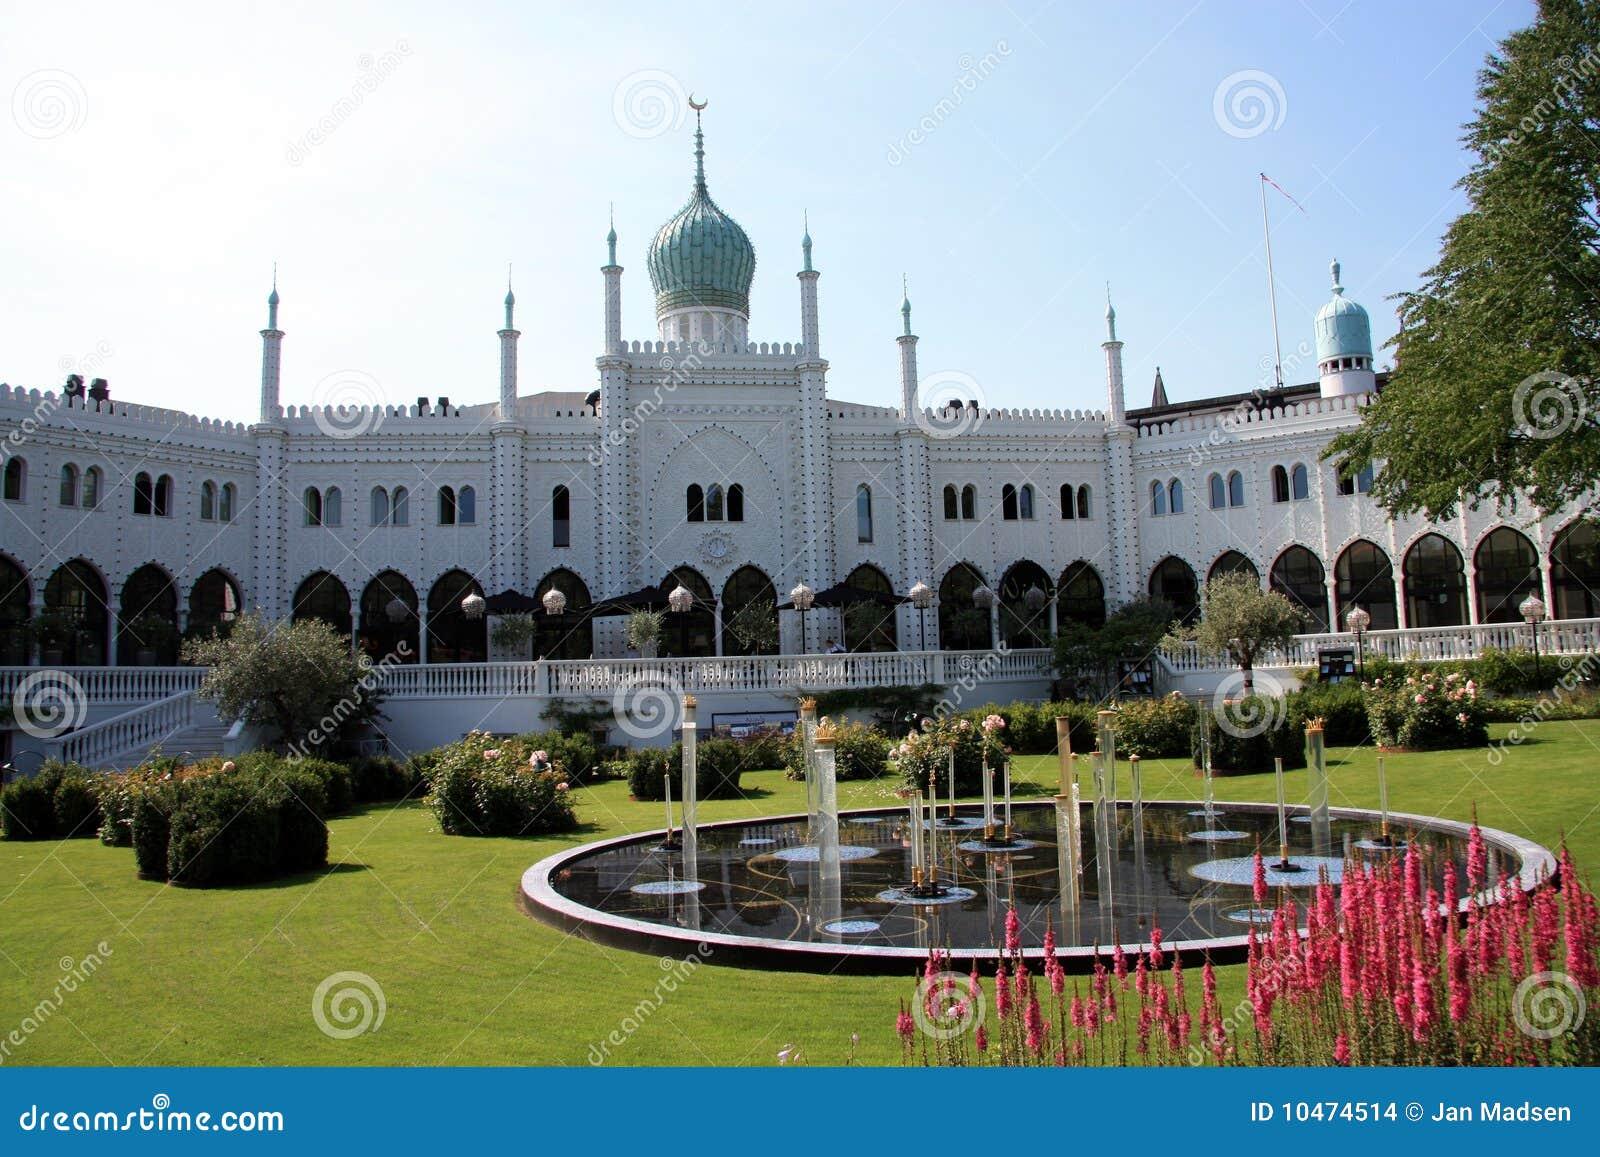 Palazzo-moschea